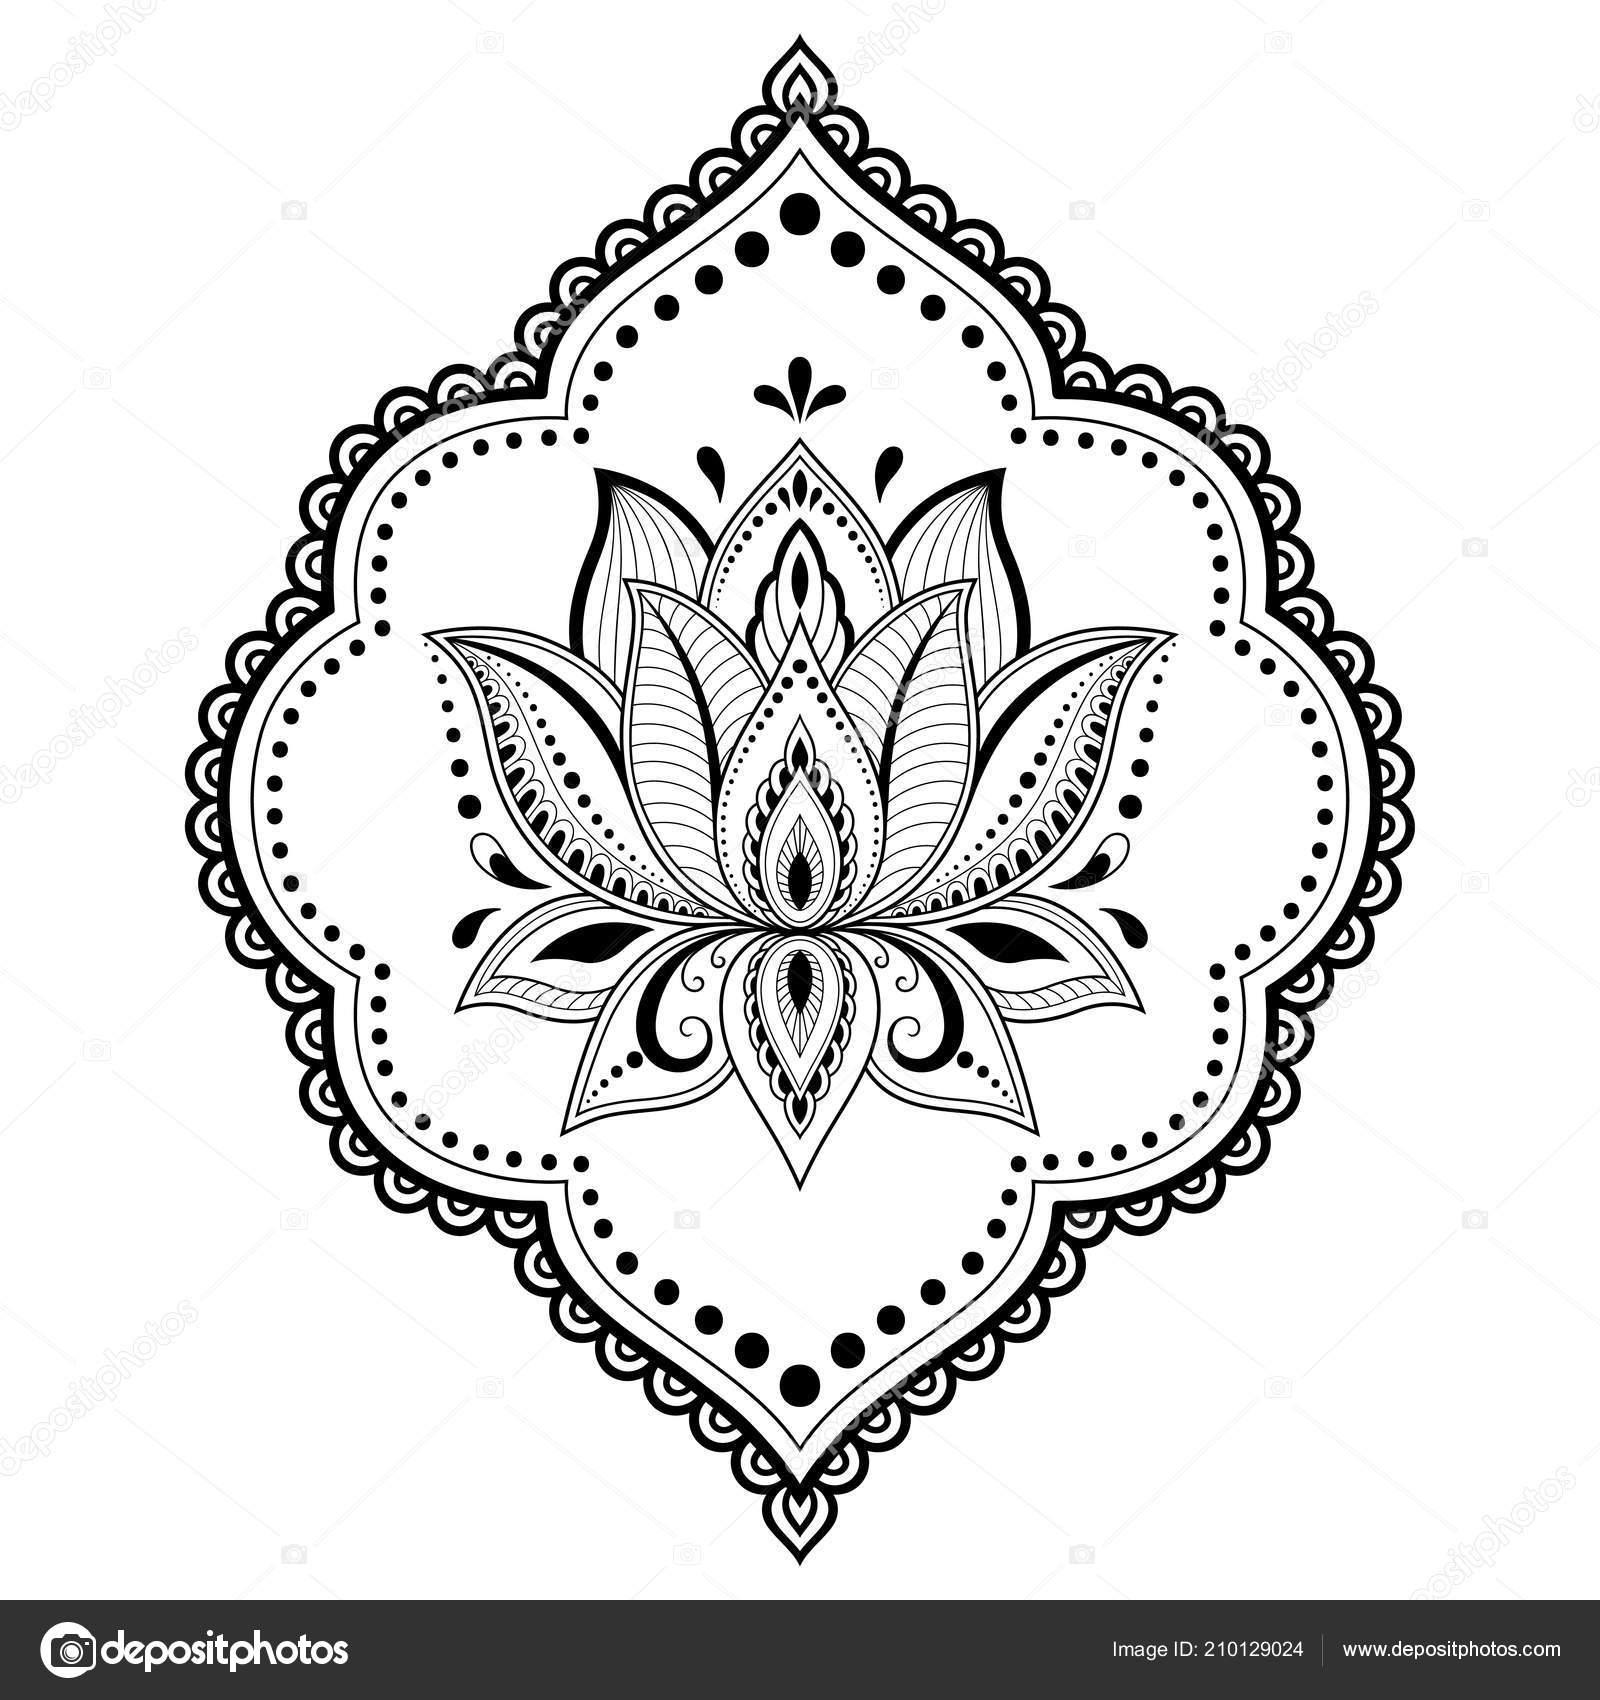 Patrón Flor Loto Mehndi Para Dibujo Henna Tatuajes Decoración Estilo